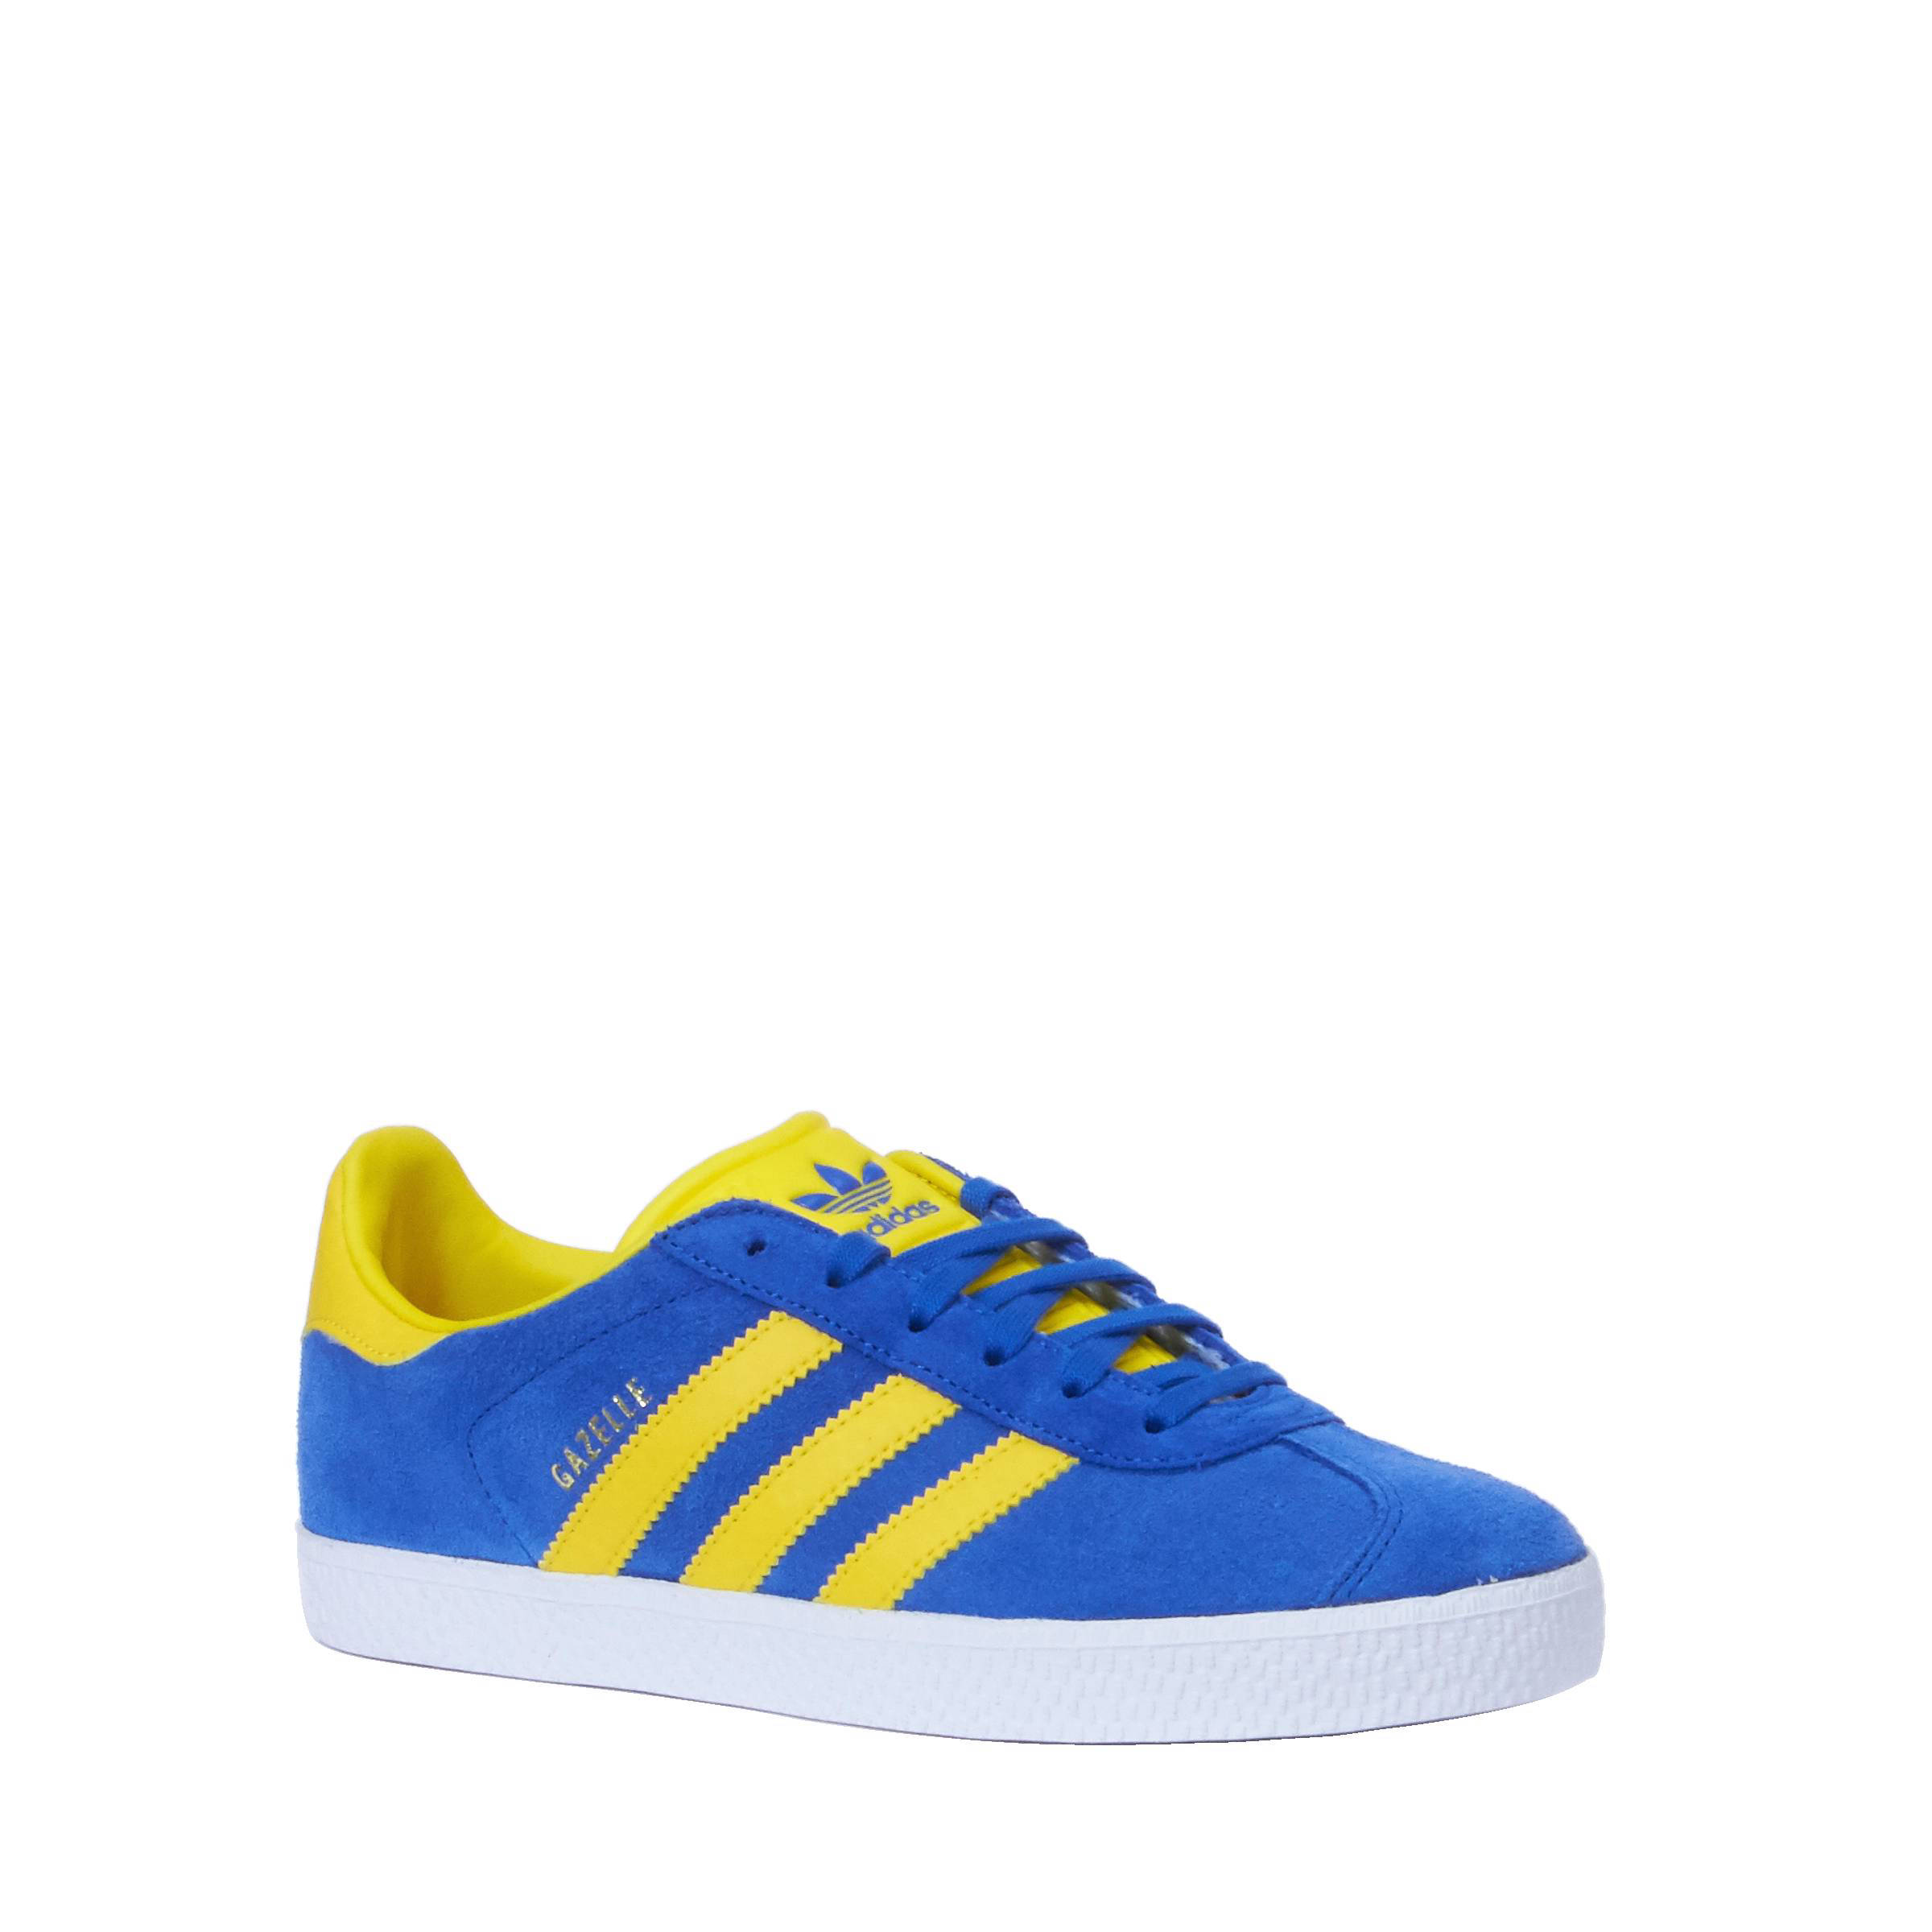 adidas gazelle og blauw yellow